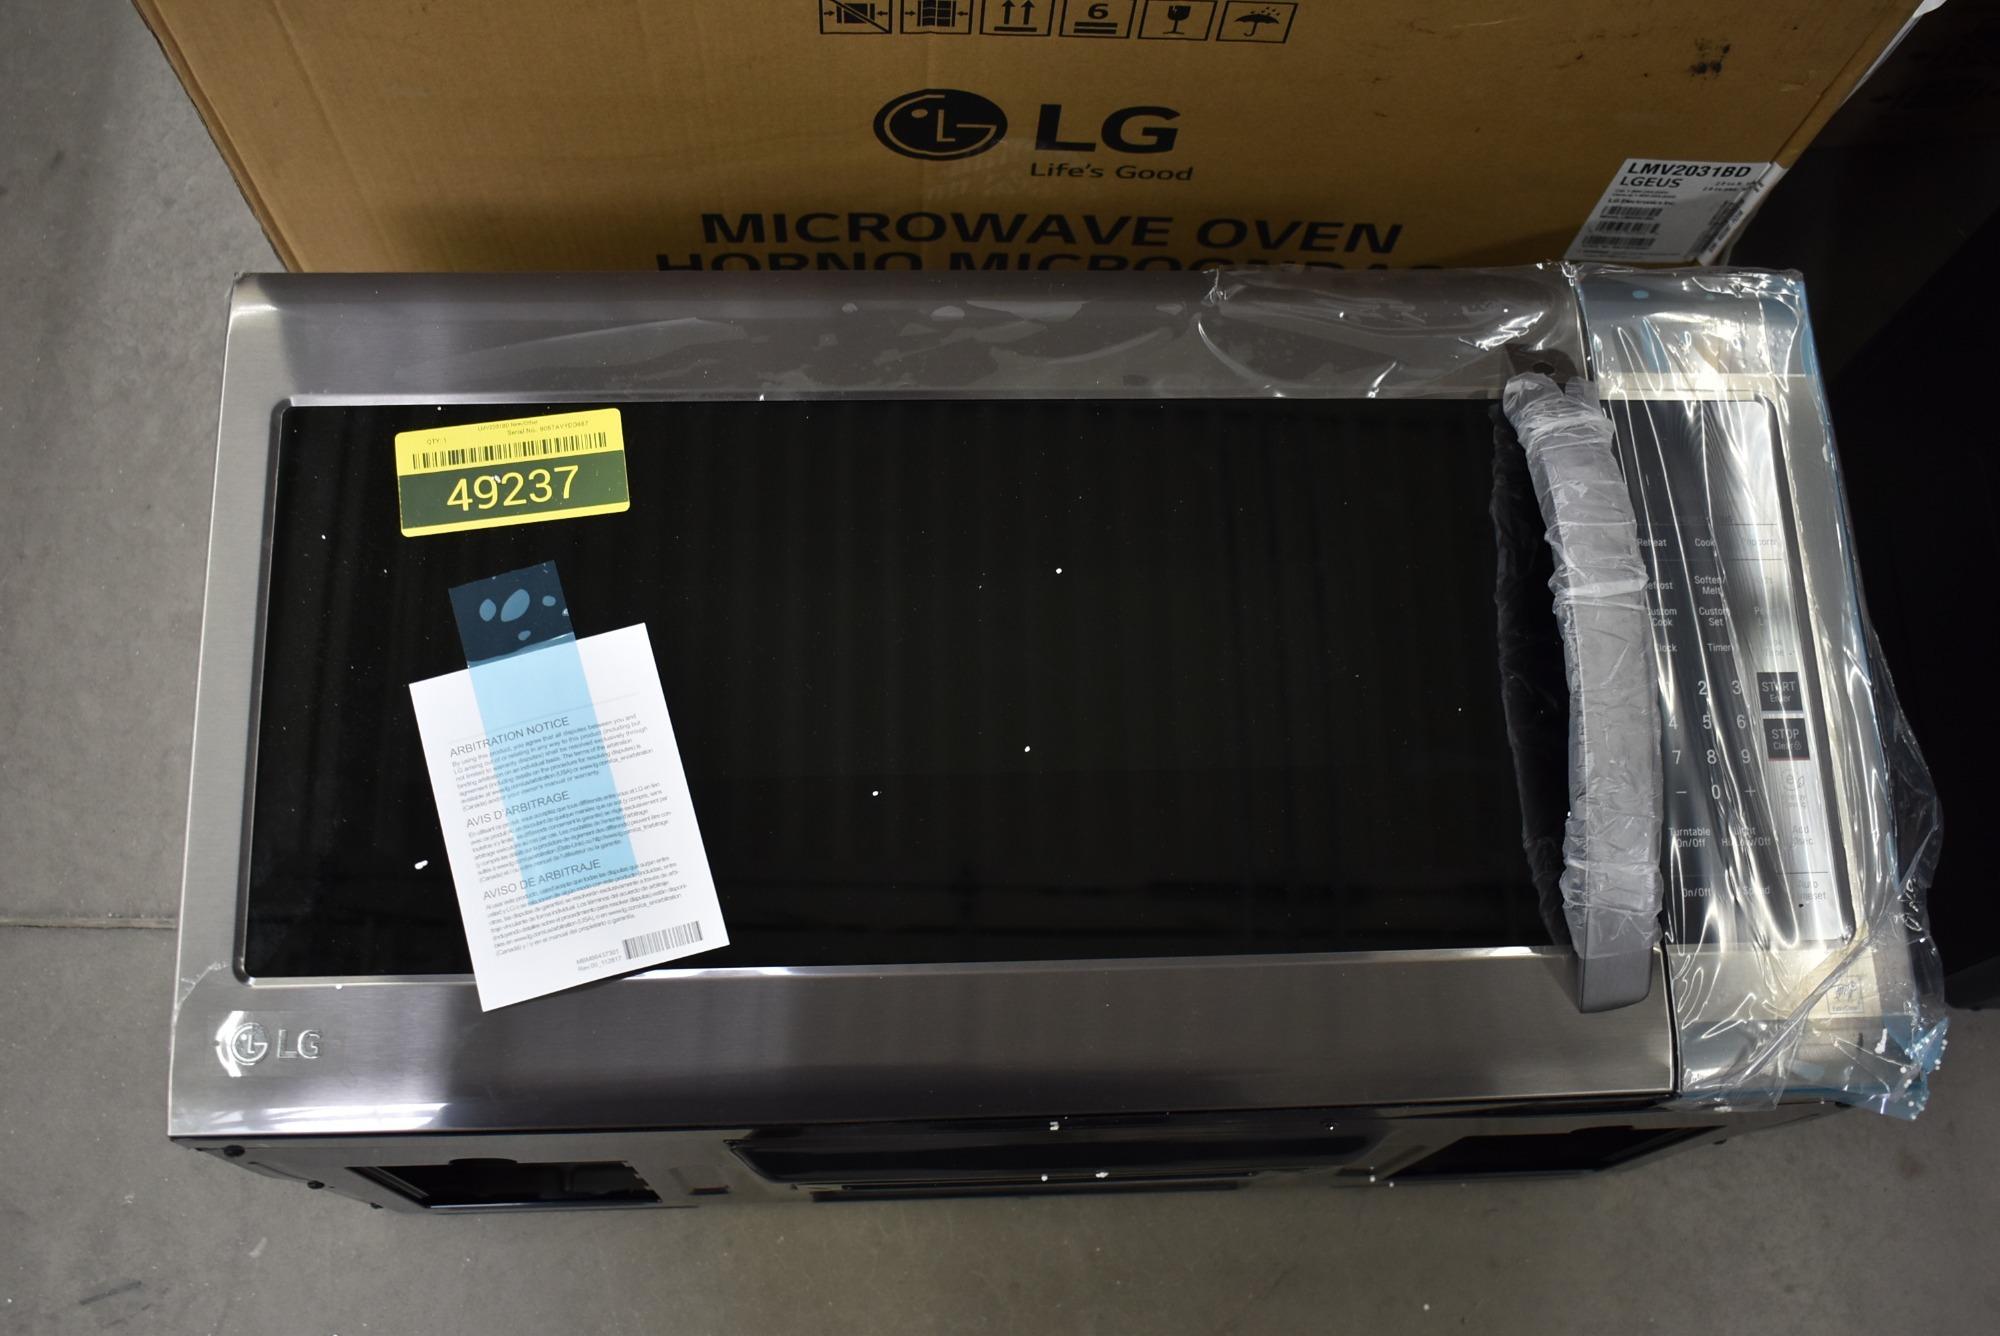 LG LMV2031BD 30